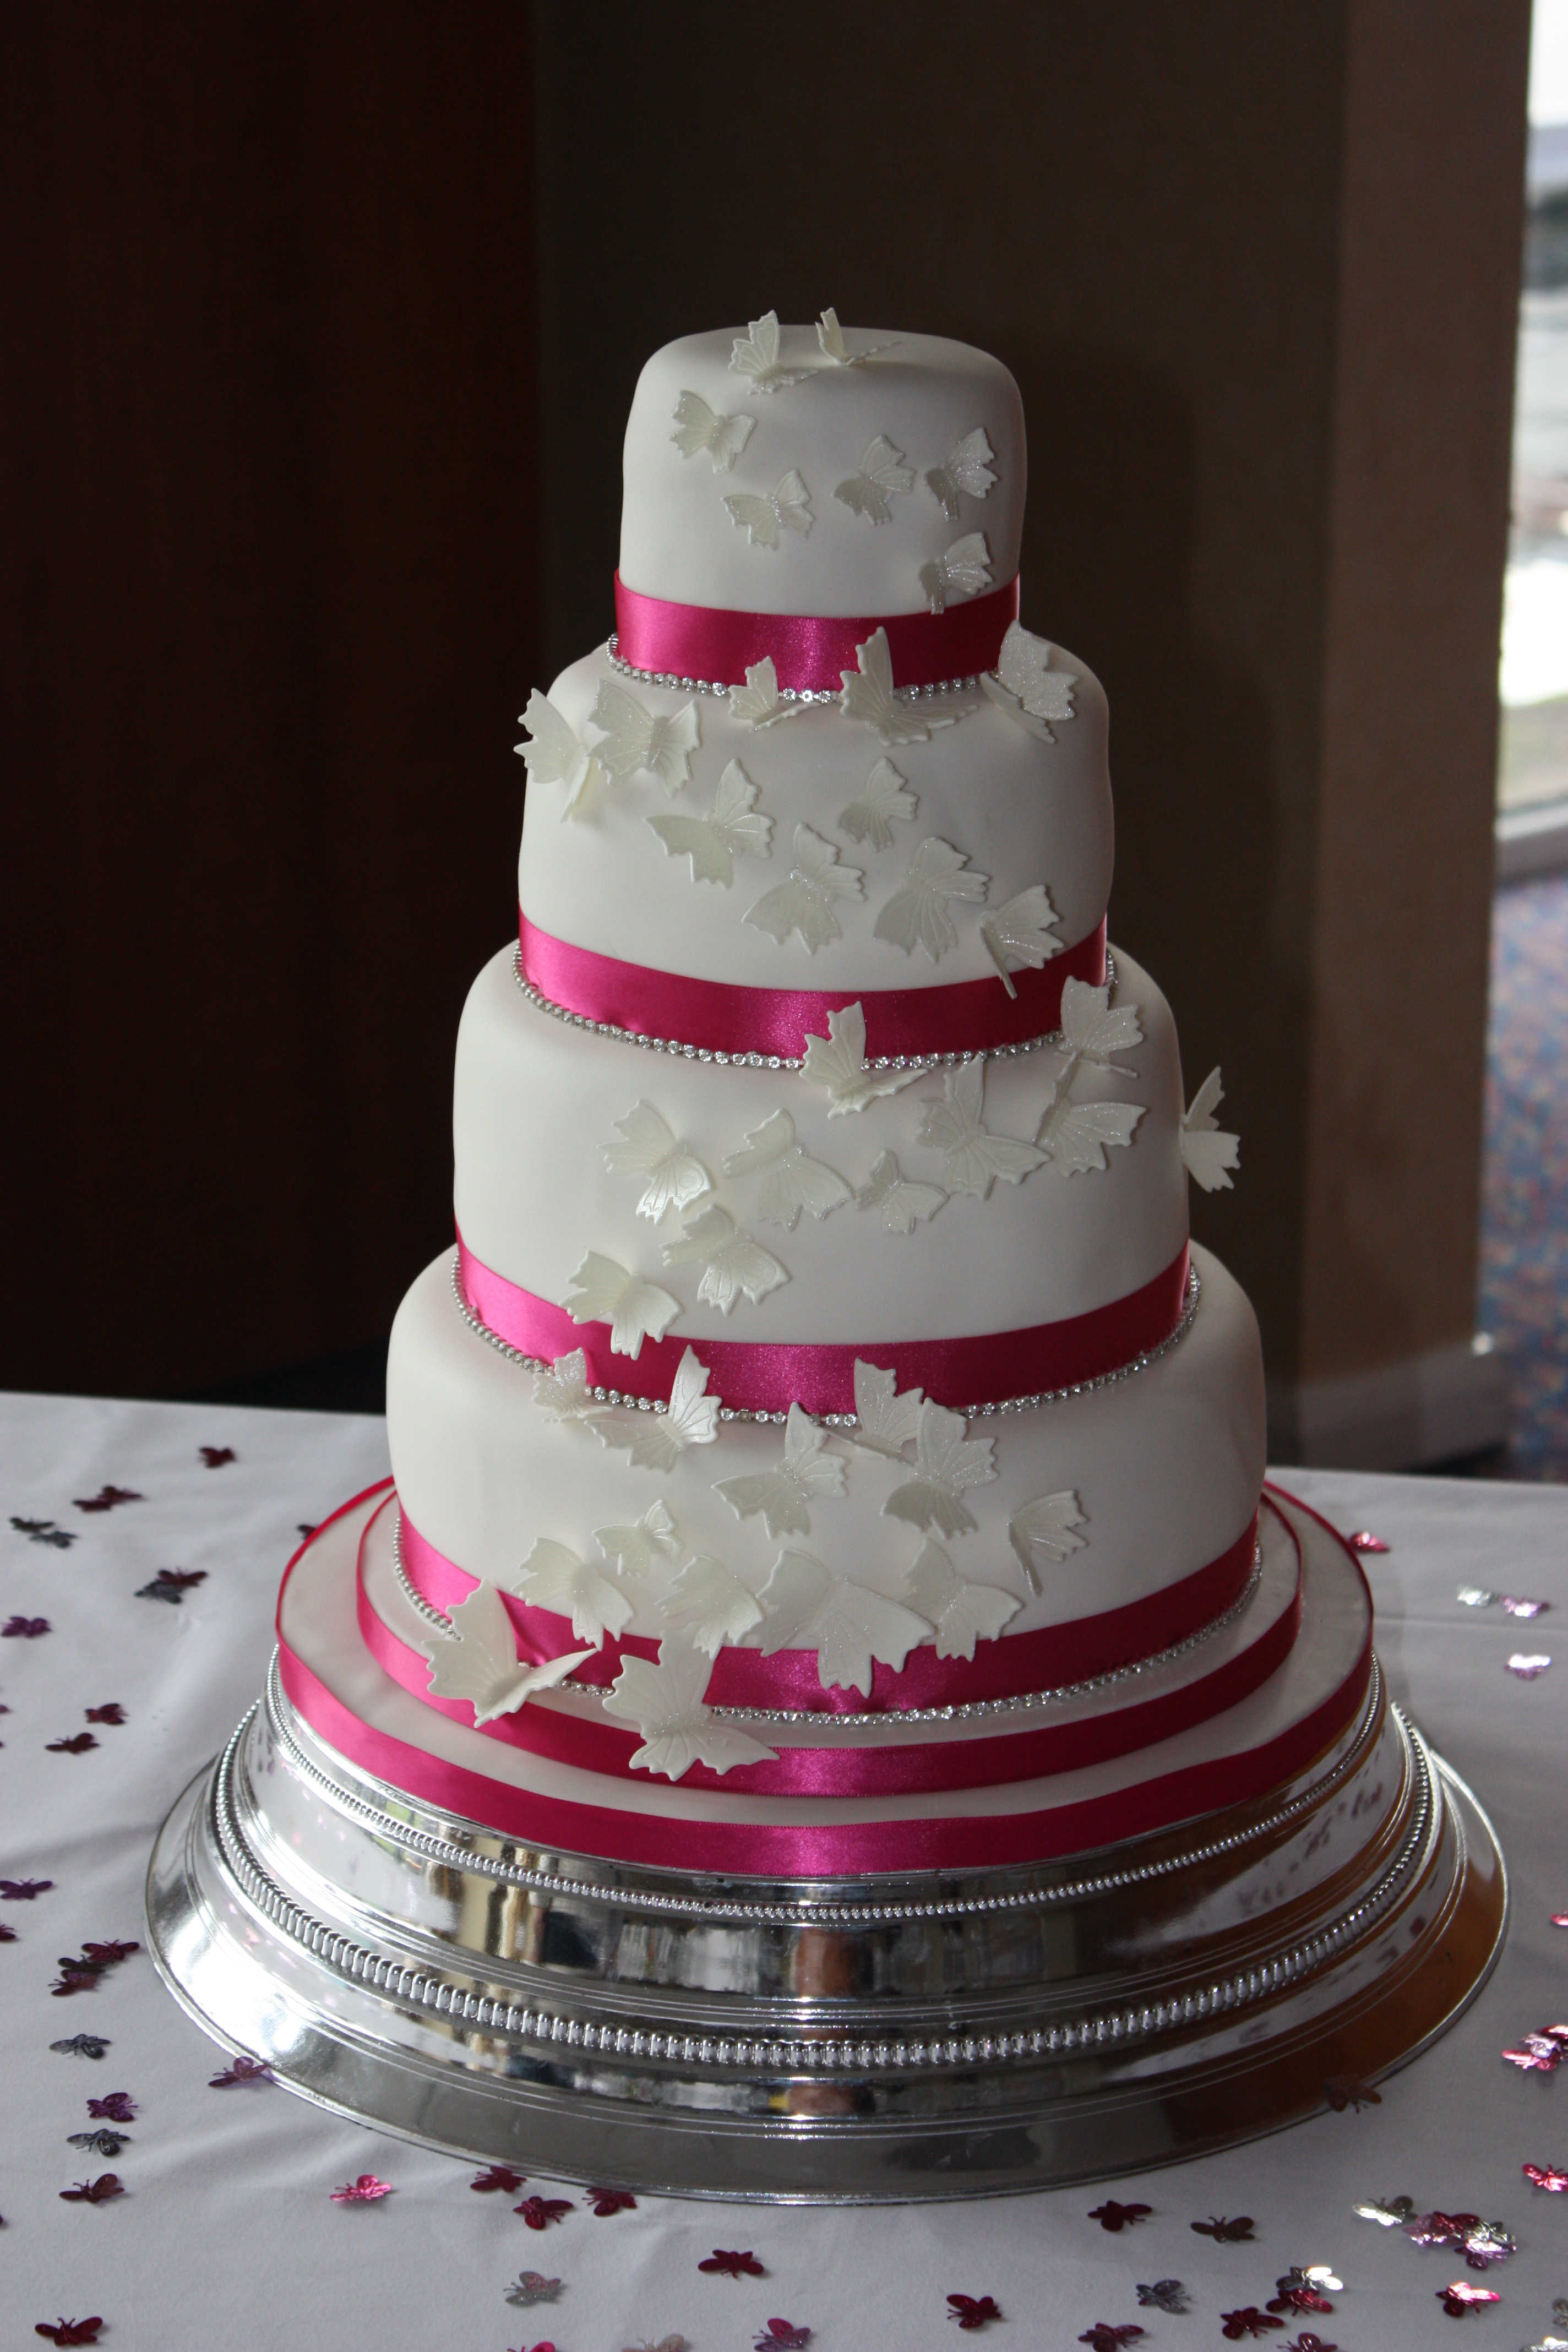 Birthday Cakes The Crafty Network